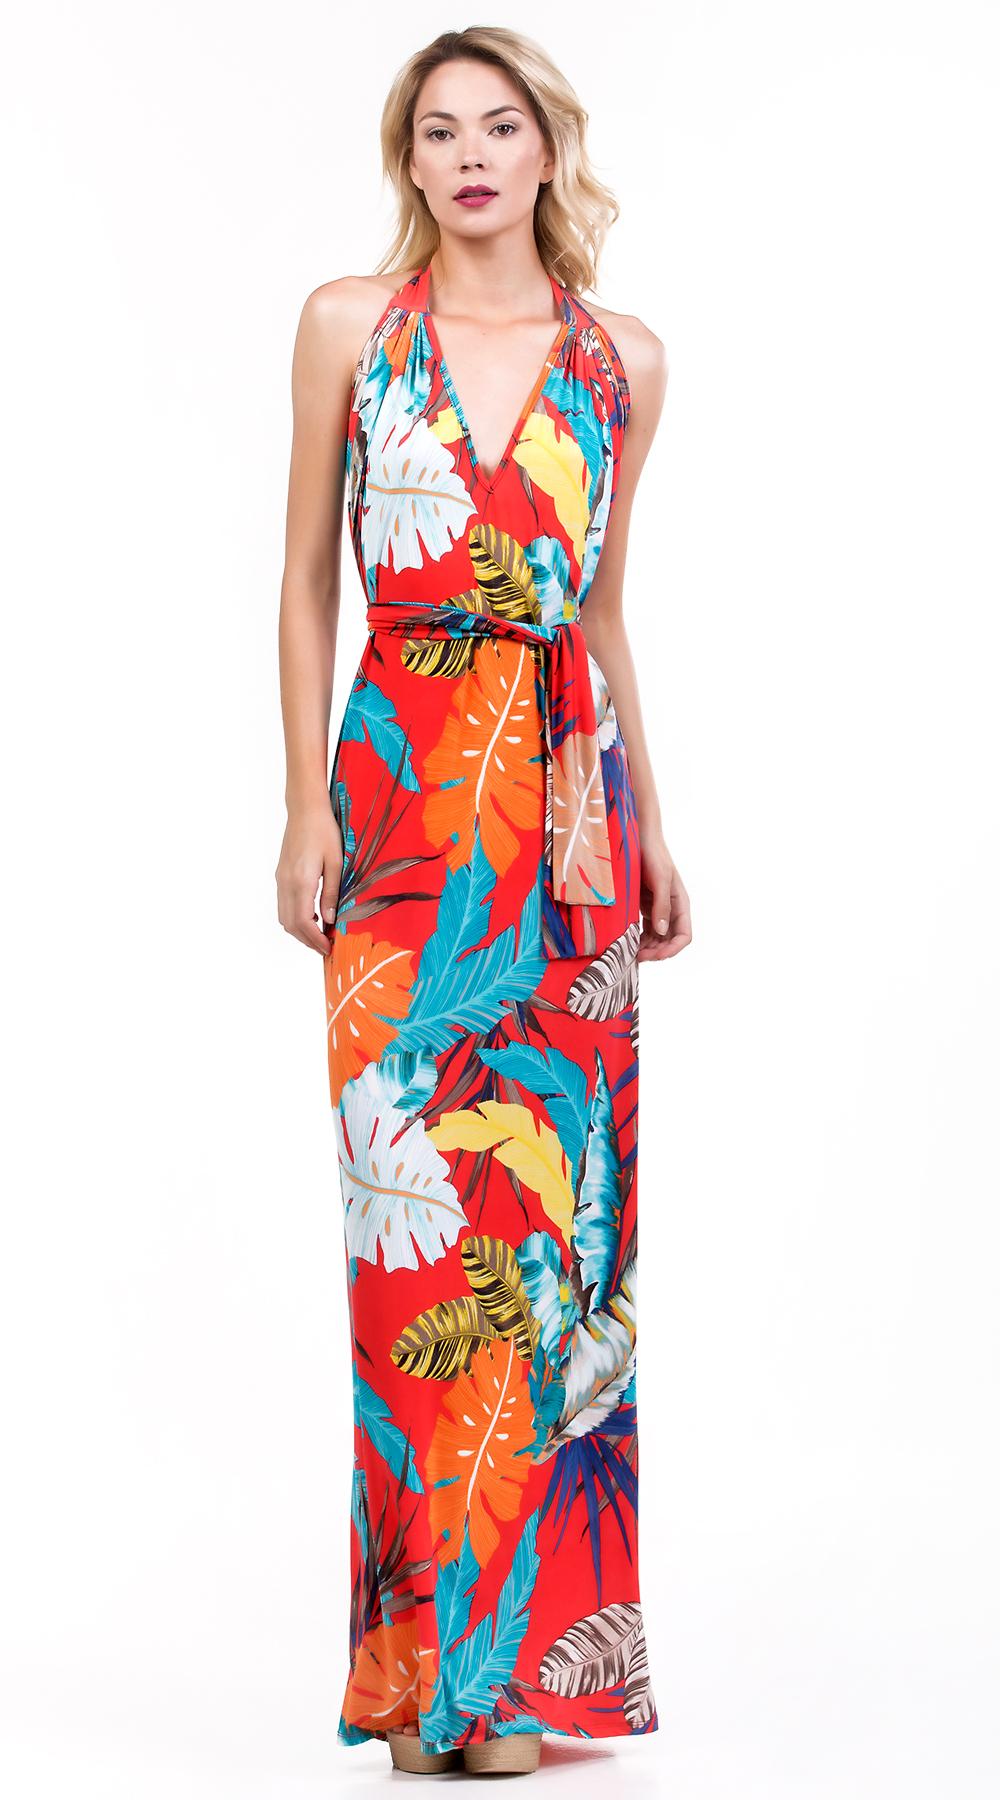 3fd489368a43 Μάξι εξώπλατο φόρεμα με πολύχρωμα τροπικά prints Online - ONLINE - S17ON -1713082